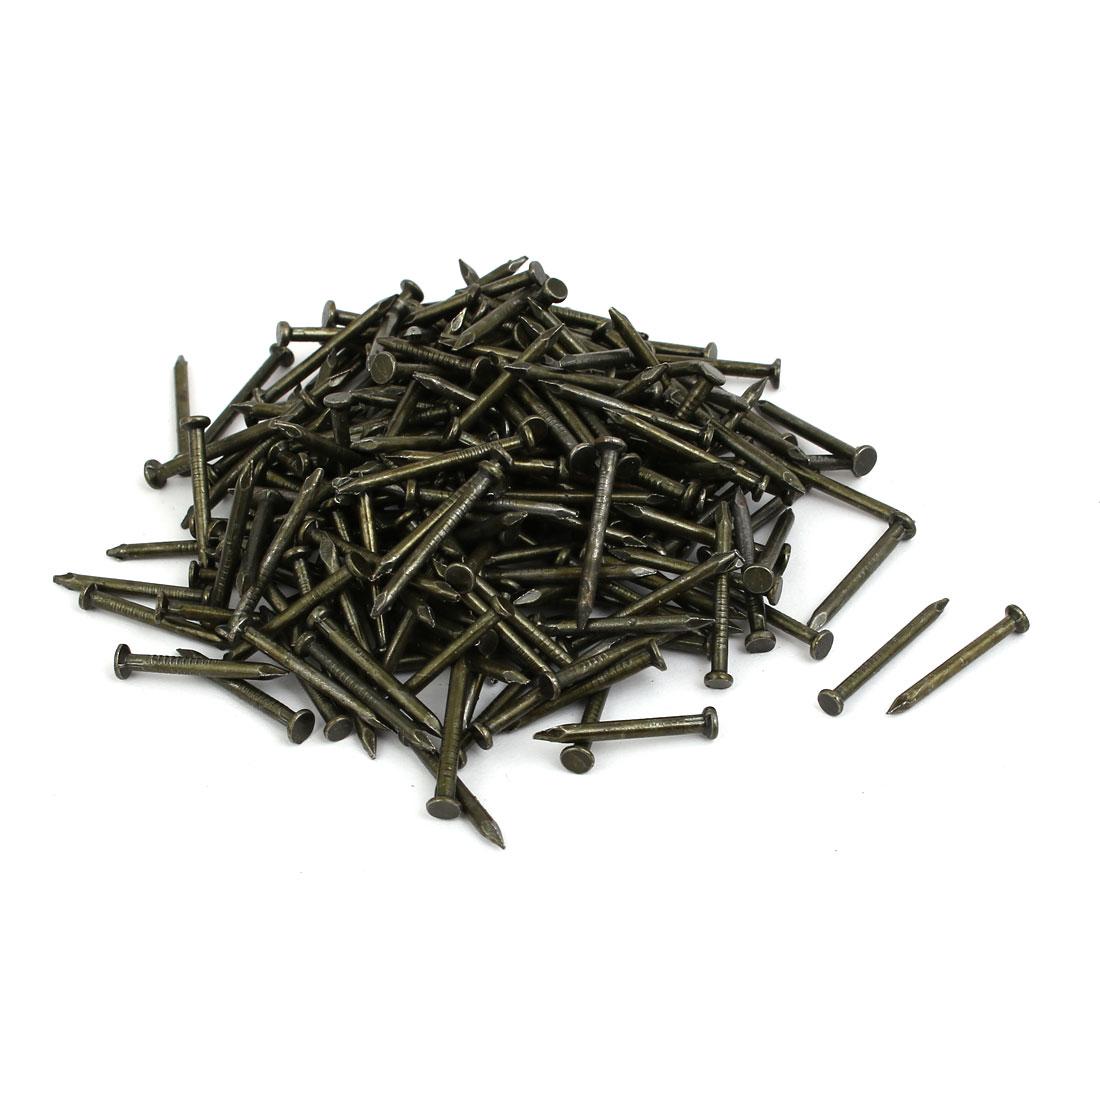 Fiber Concrete Cement Wall Carbon Steel Point Tip Wire Nails 2mmx20mm 500PCS